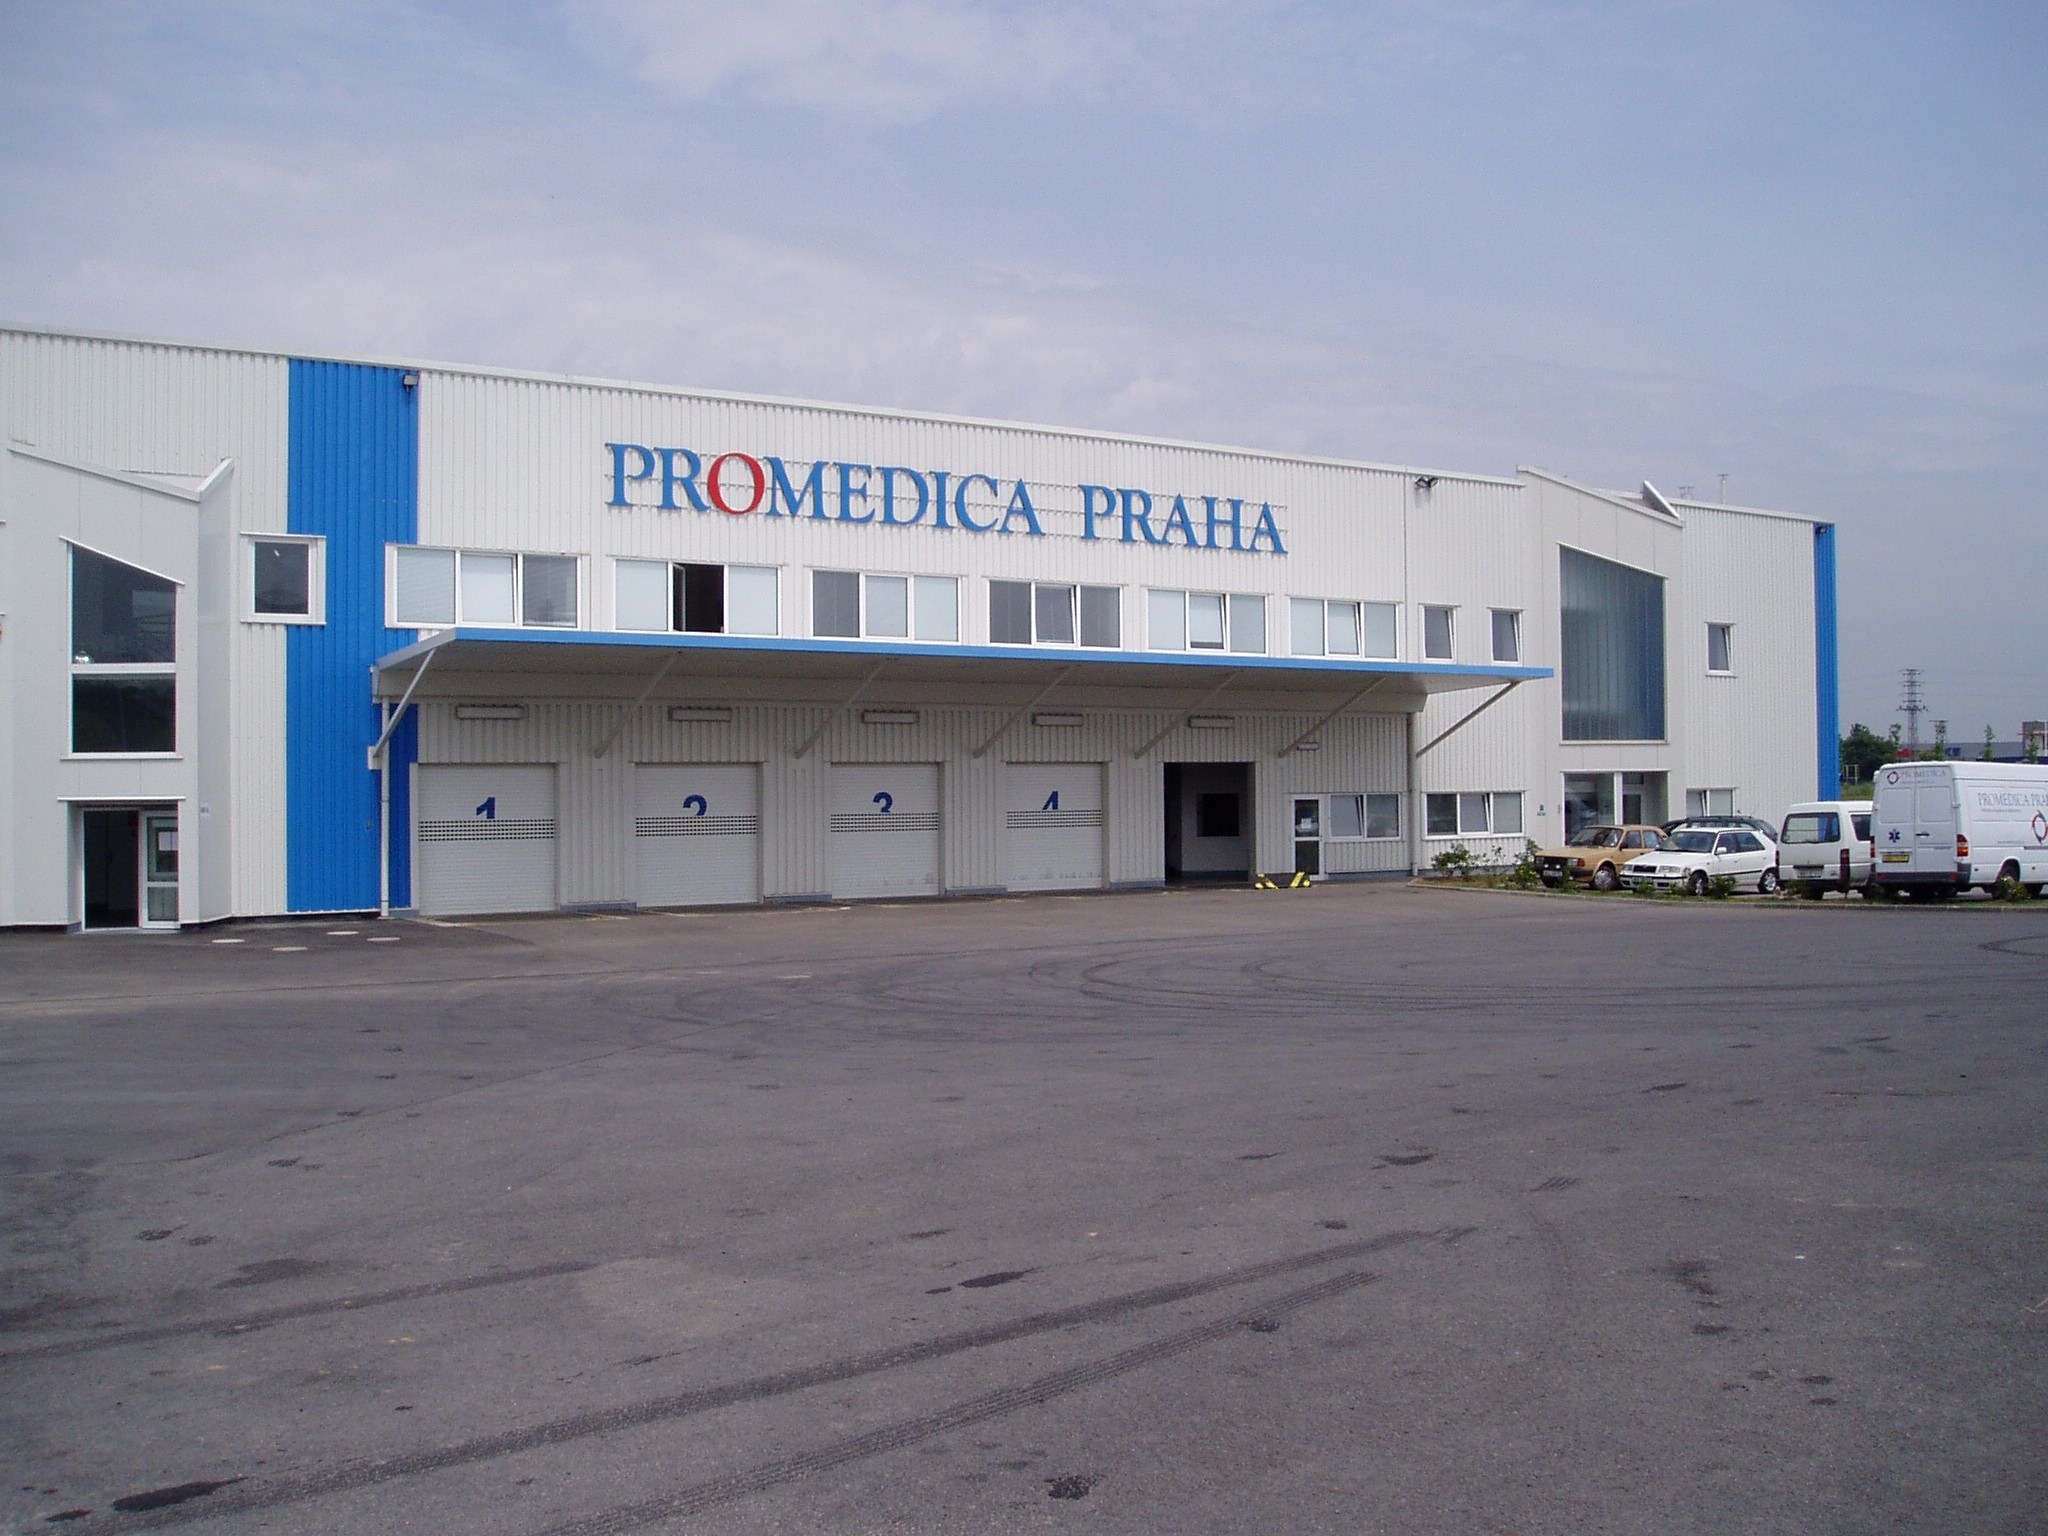 Promedica Praha Group 2. etapa